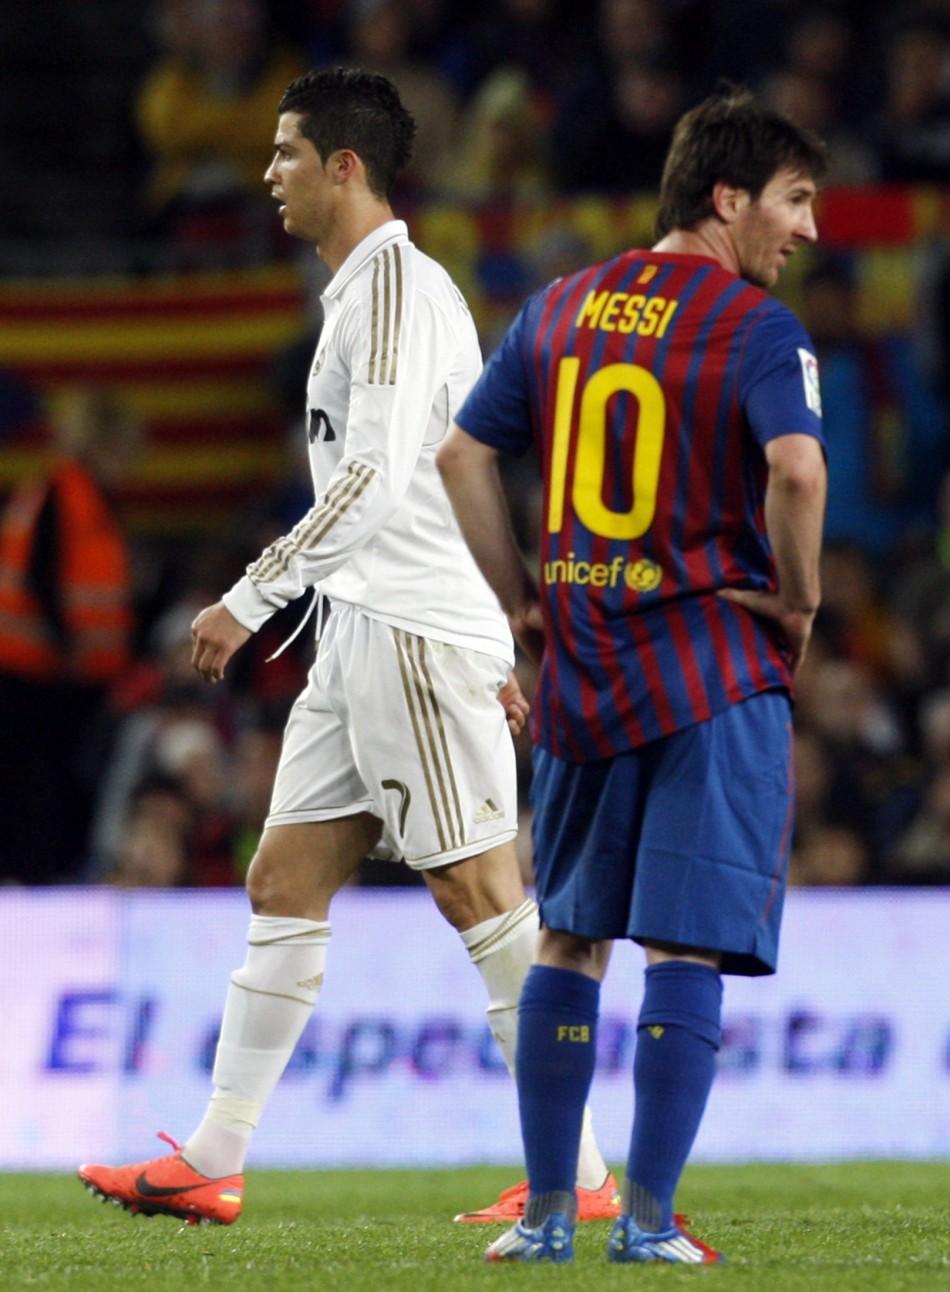 Christina Ronaldo, Lionel Messi